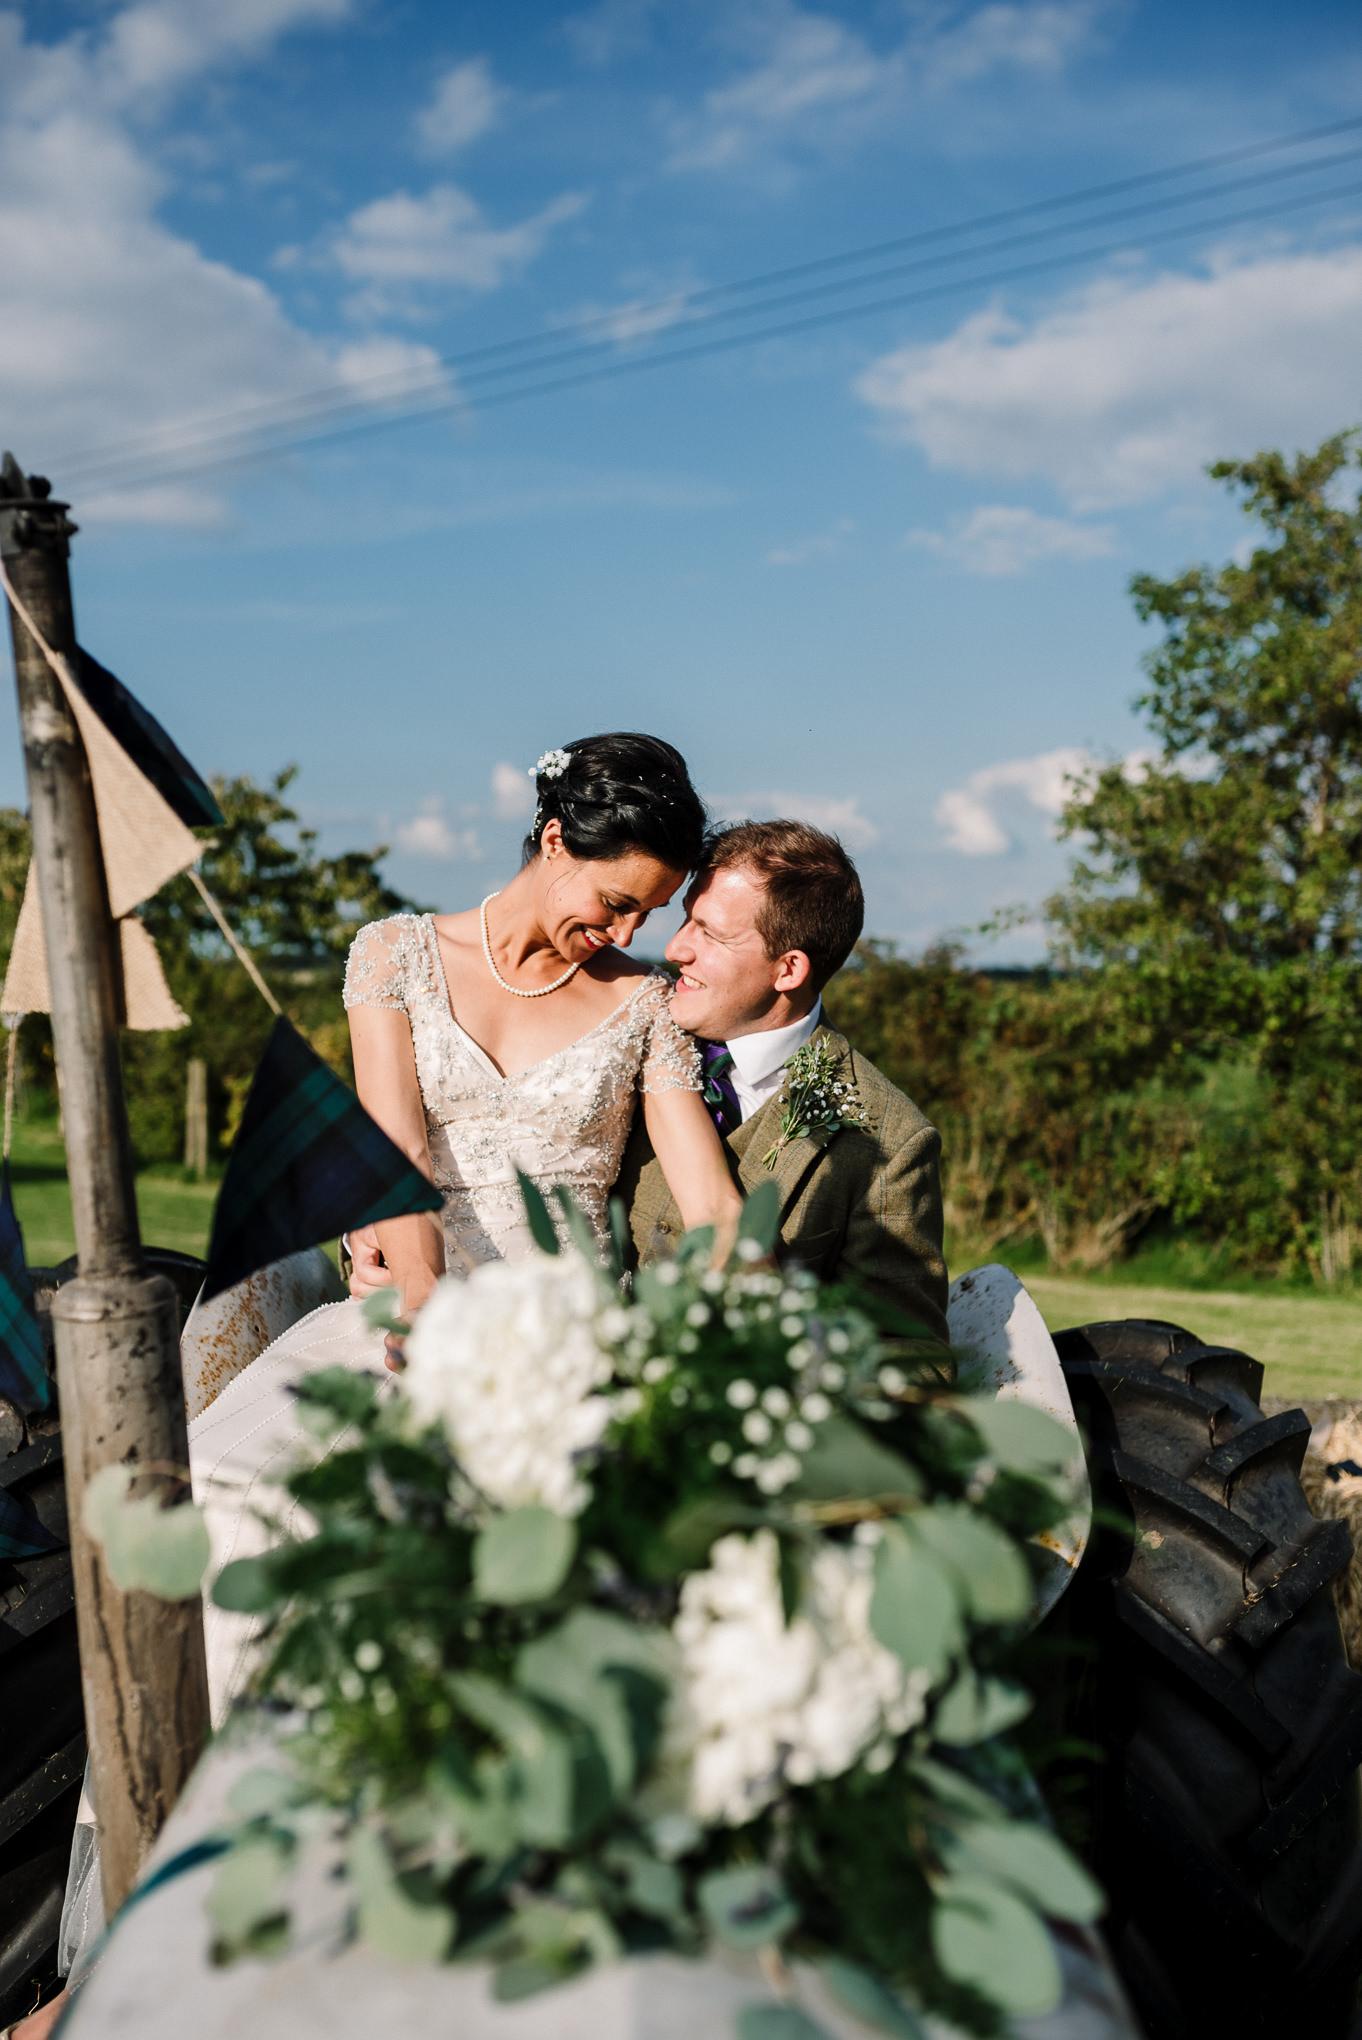 Portrait on the tractor. Farm wedding photography